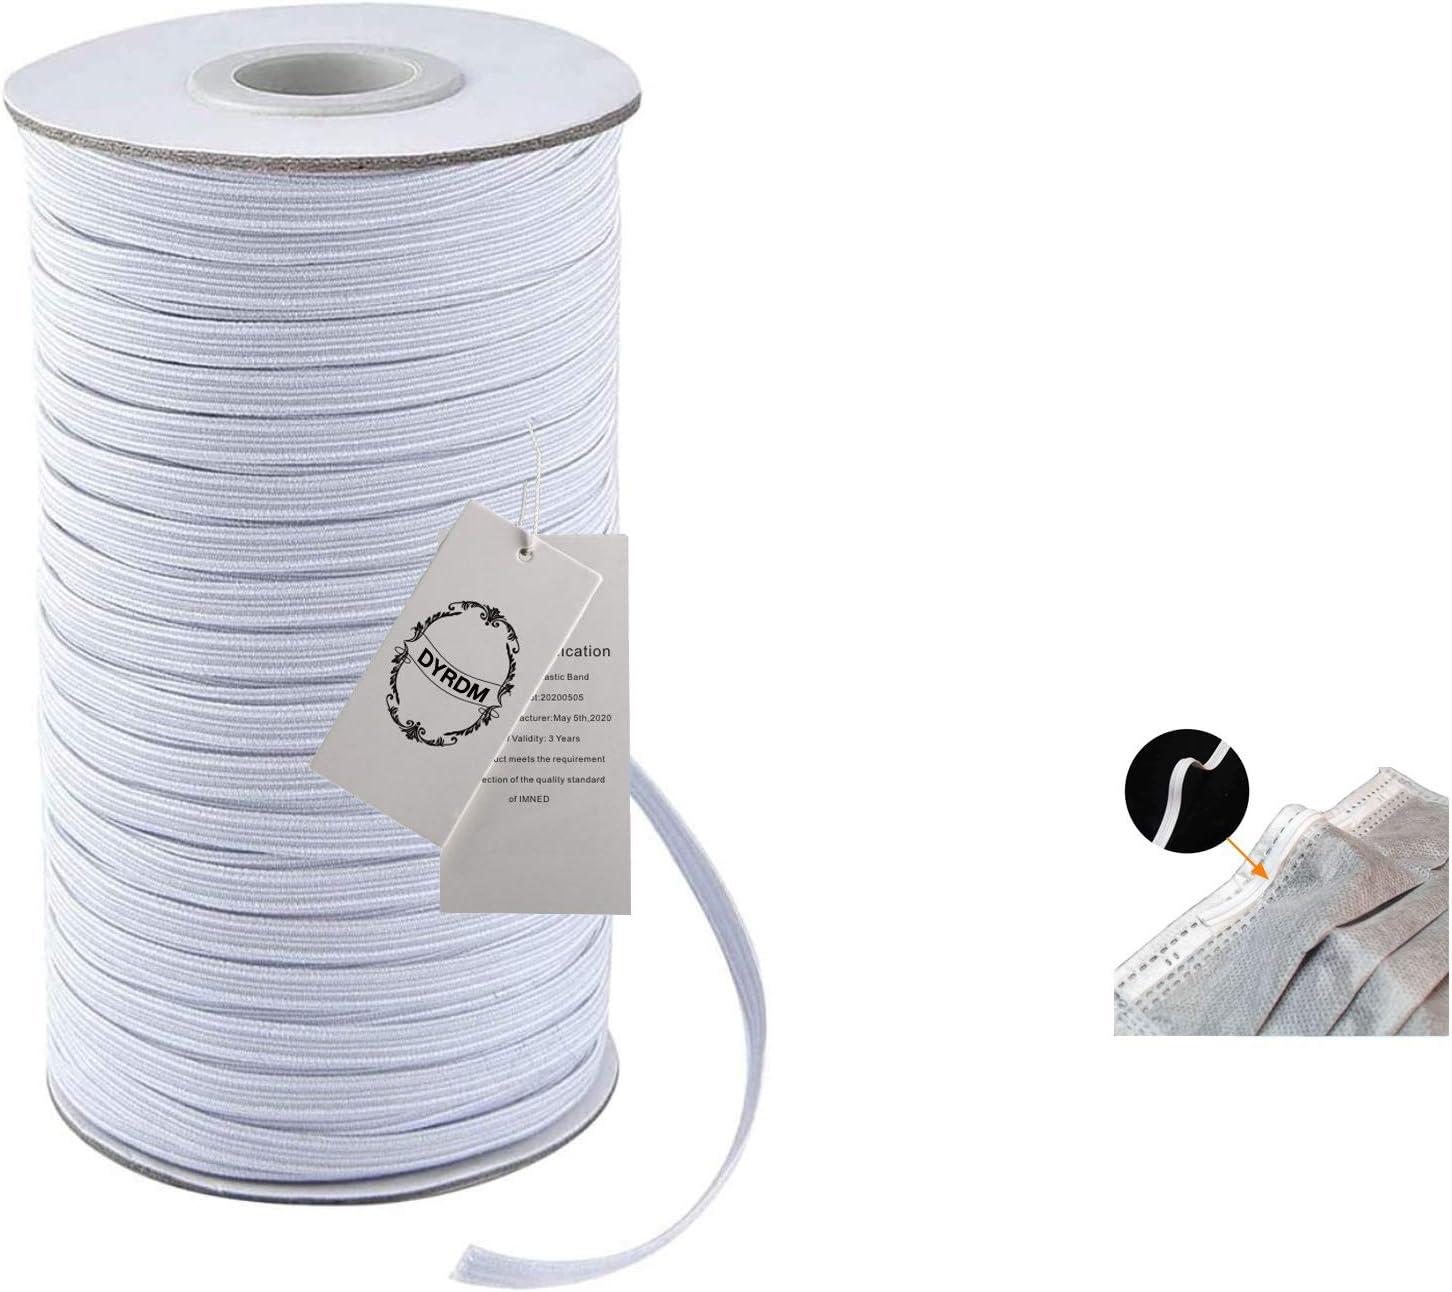 10 Yards Flat Braided Elastic Band Cord Knit String Sewing Bulk 3mm Face Shield